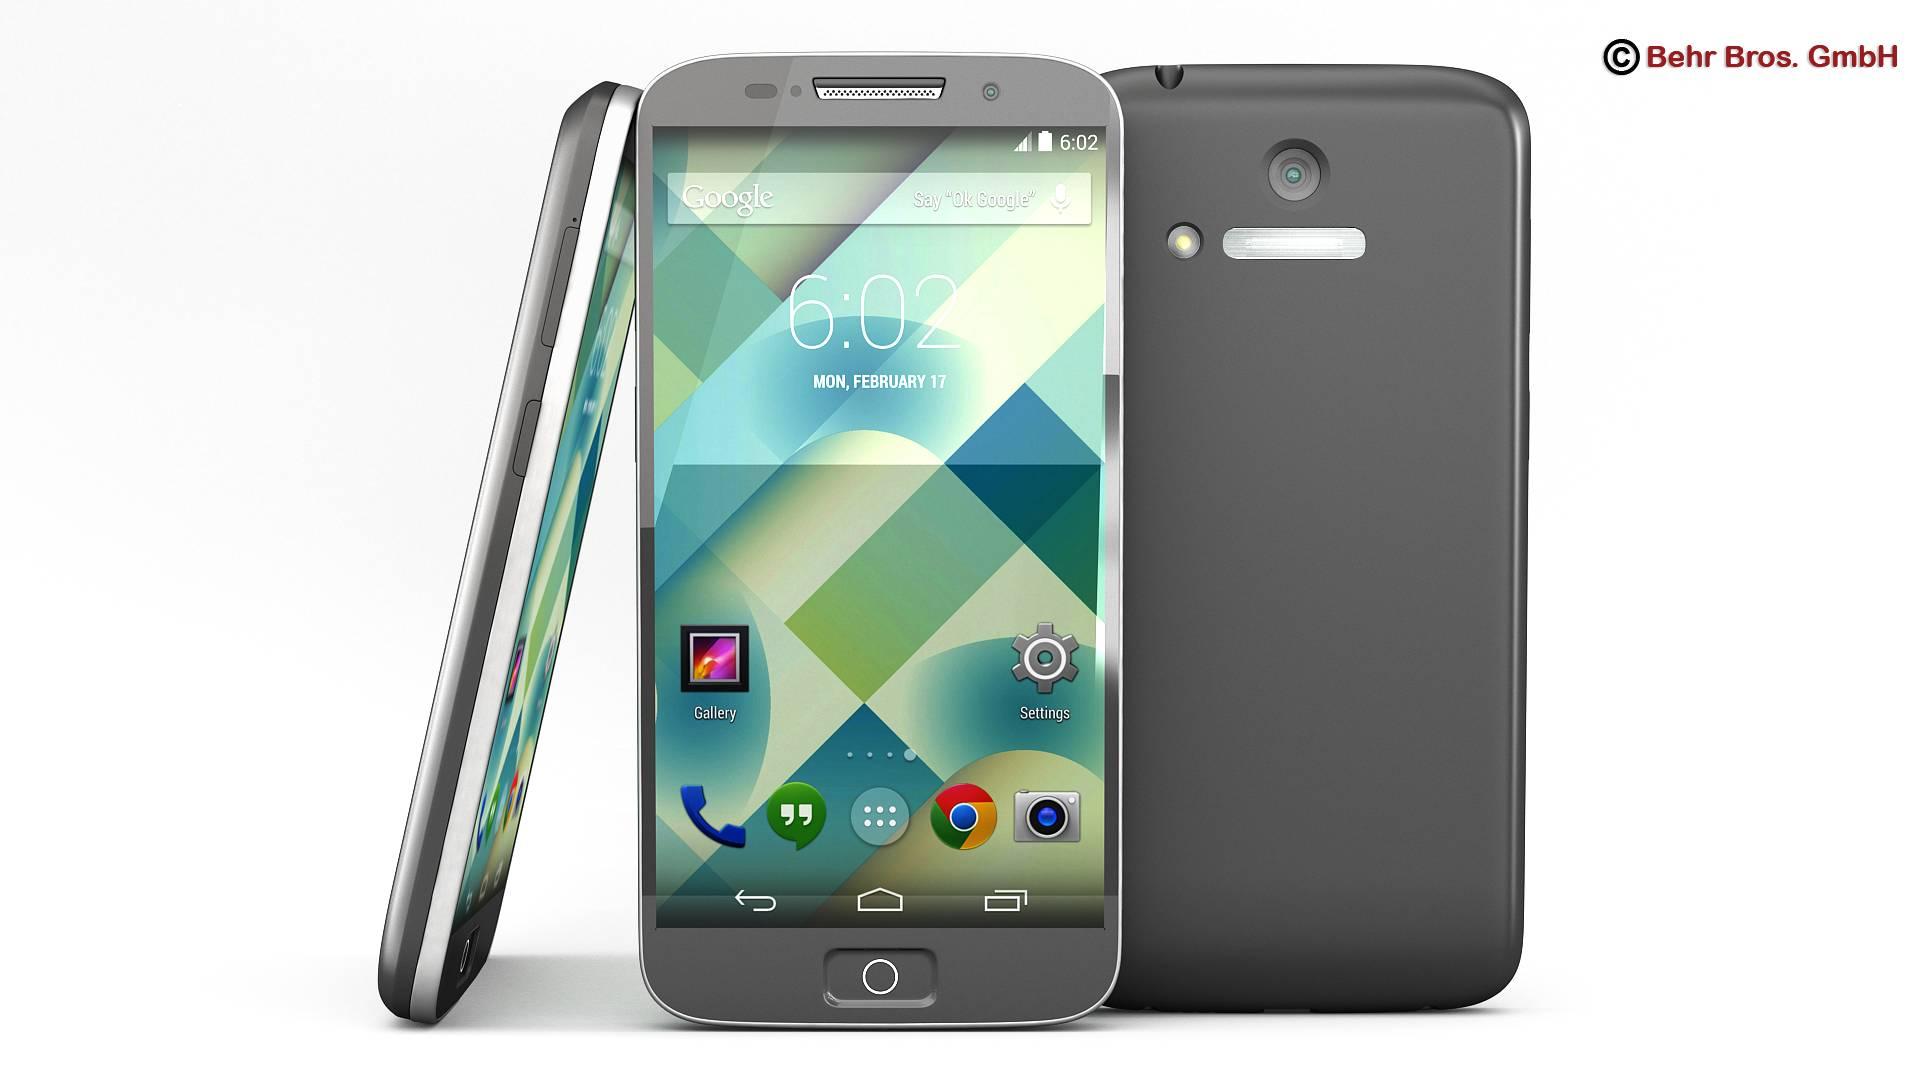 generic smartphone 4.6 inch 3d model 3ds max fbx c4d lwo ma mb obj 161634